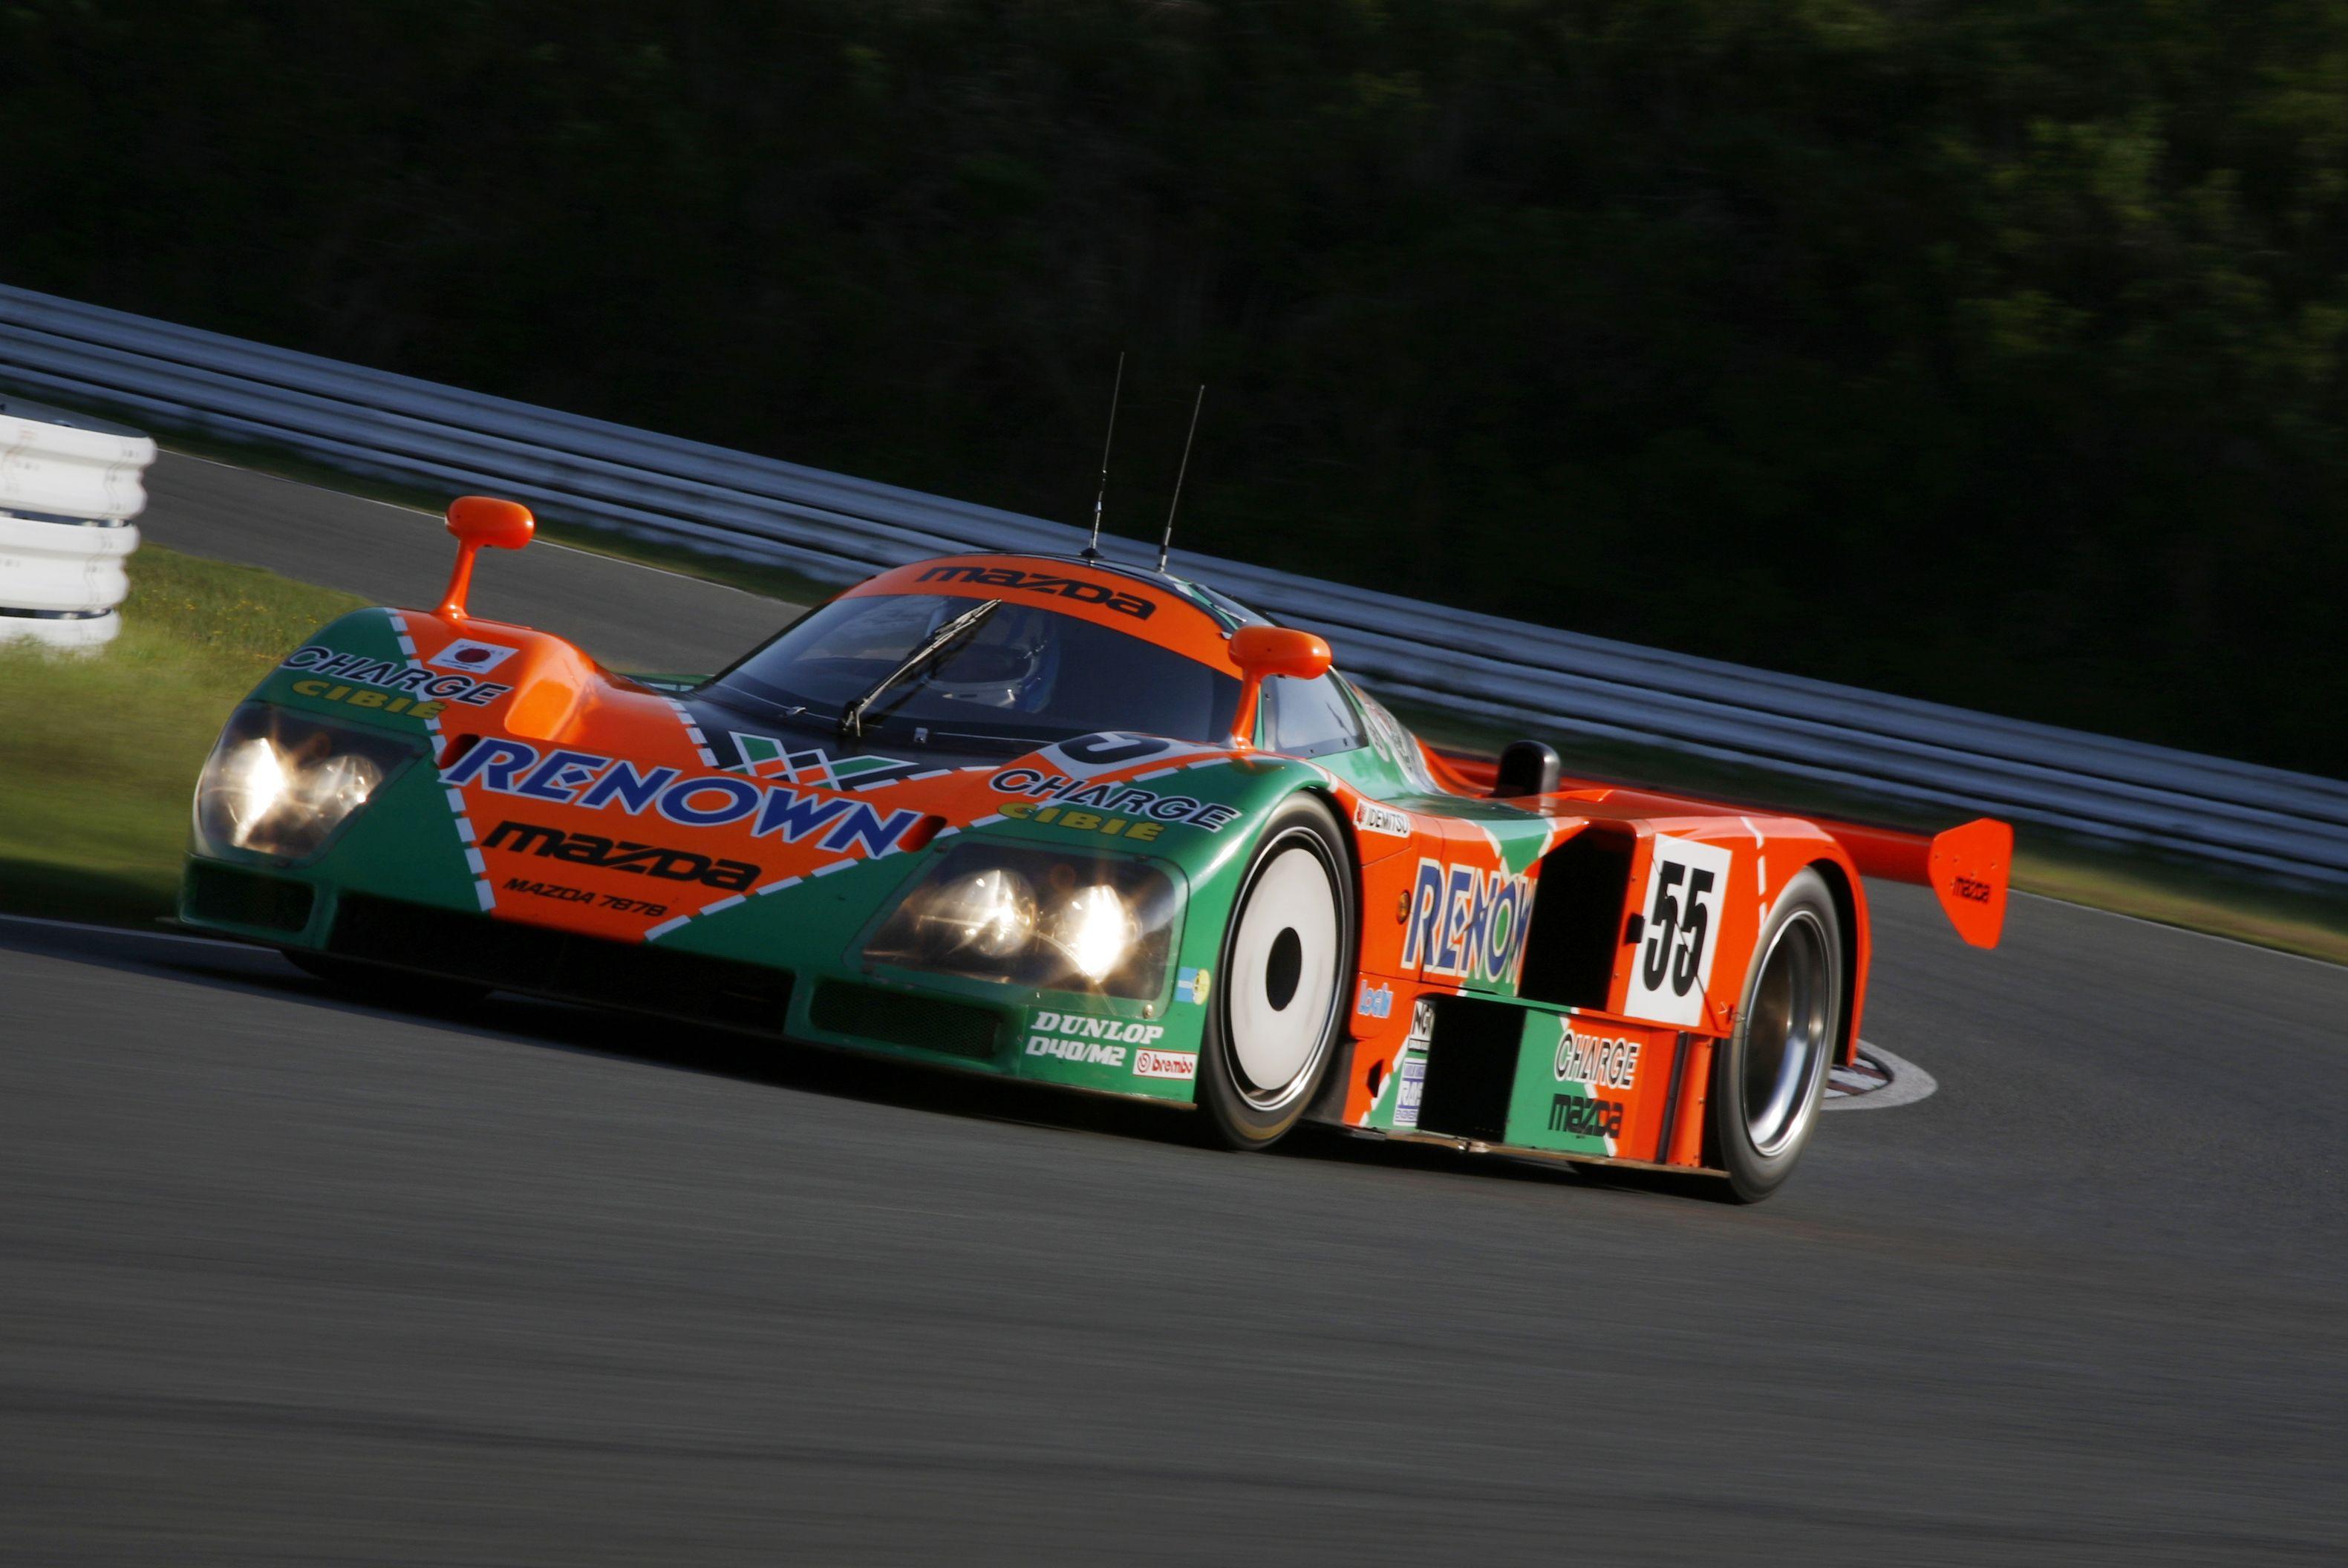 Mazda's 1991 Le Mans-winning